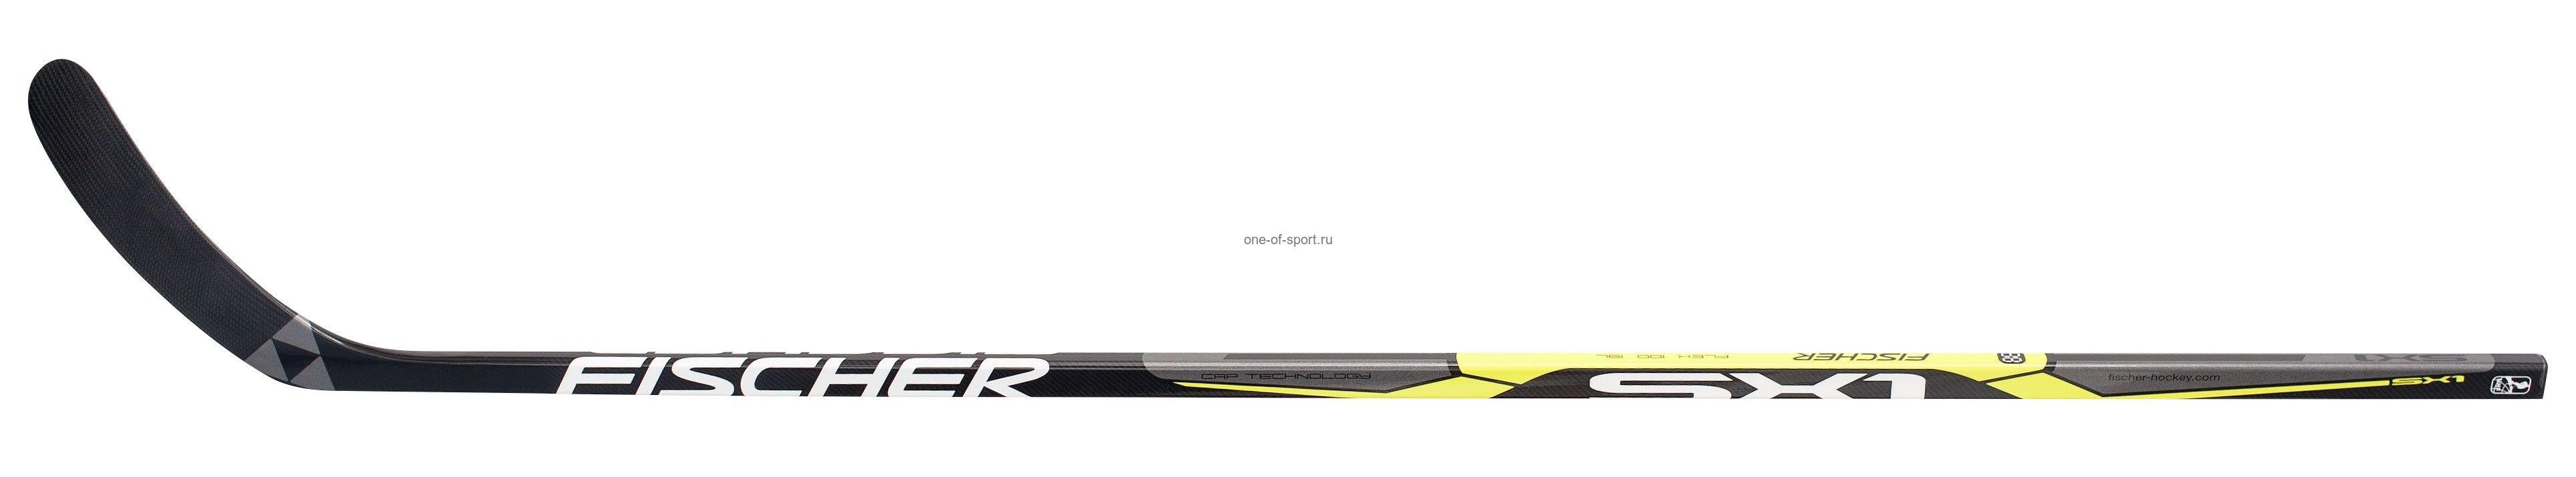 Клюшка хоккейная Fischer SX1 100 Grip SR арт.H12214